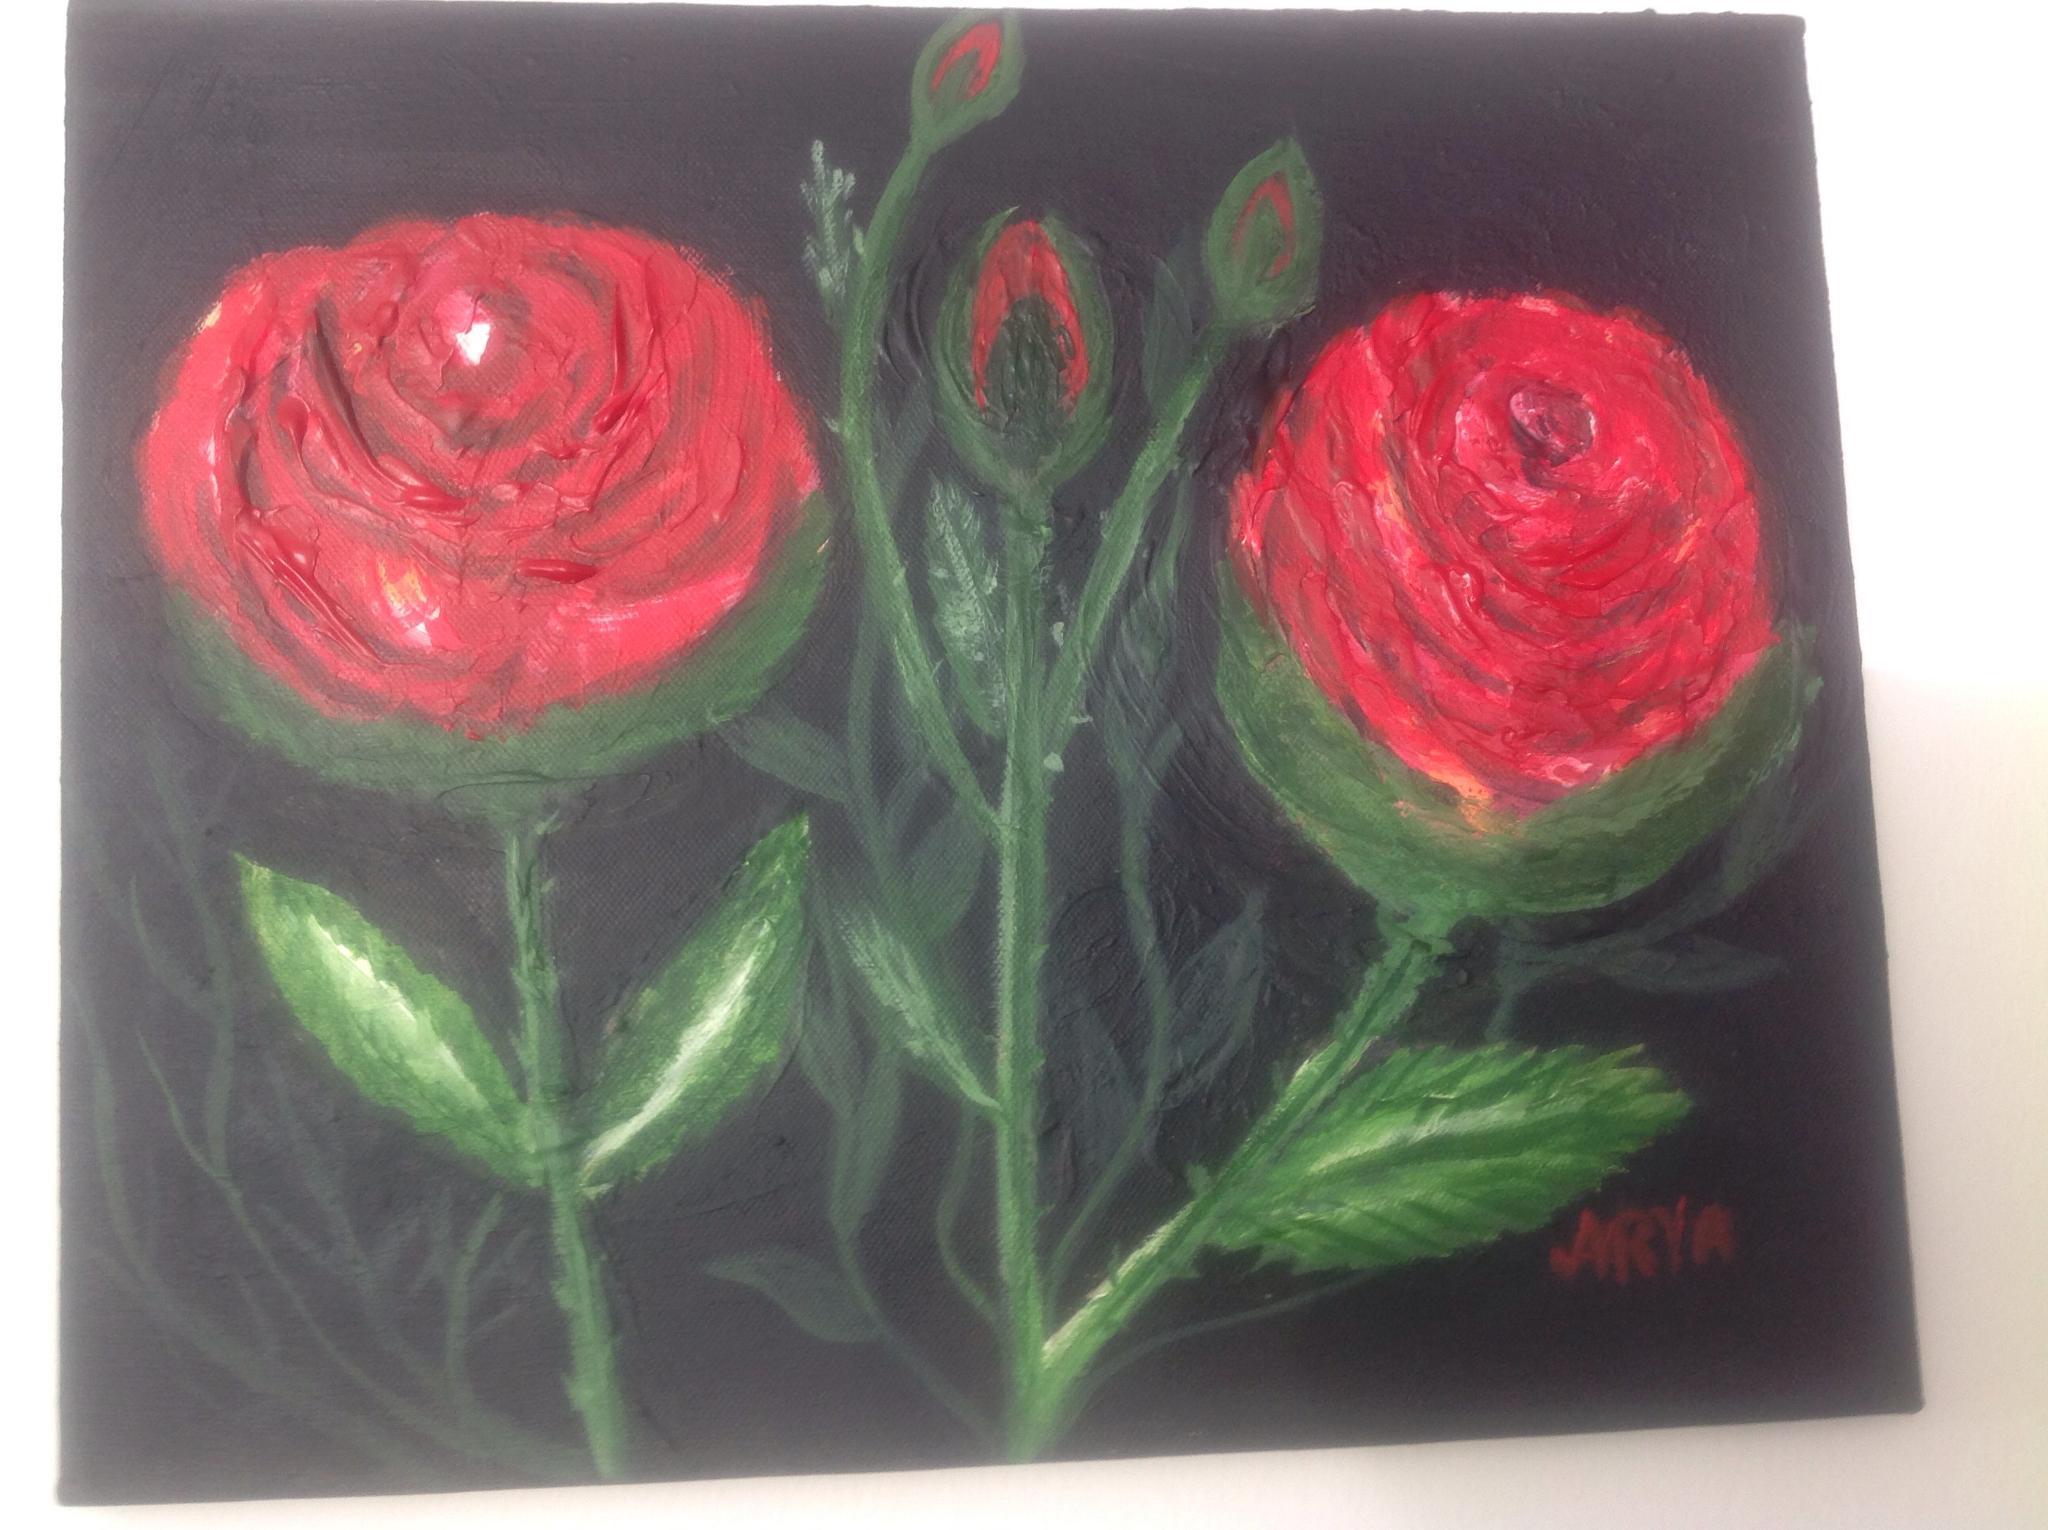 My painting acrylic on convas by Akram Monfared Arya